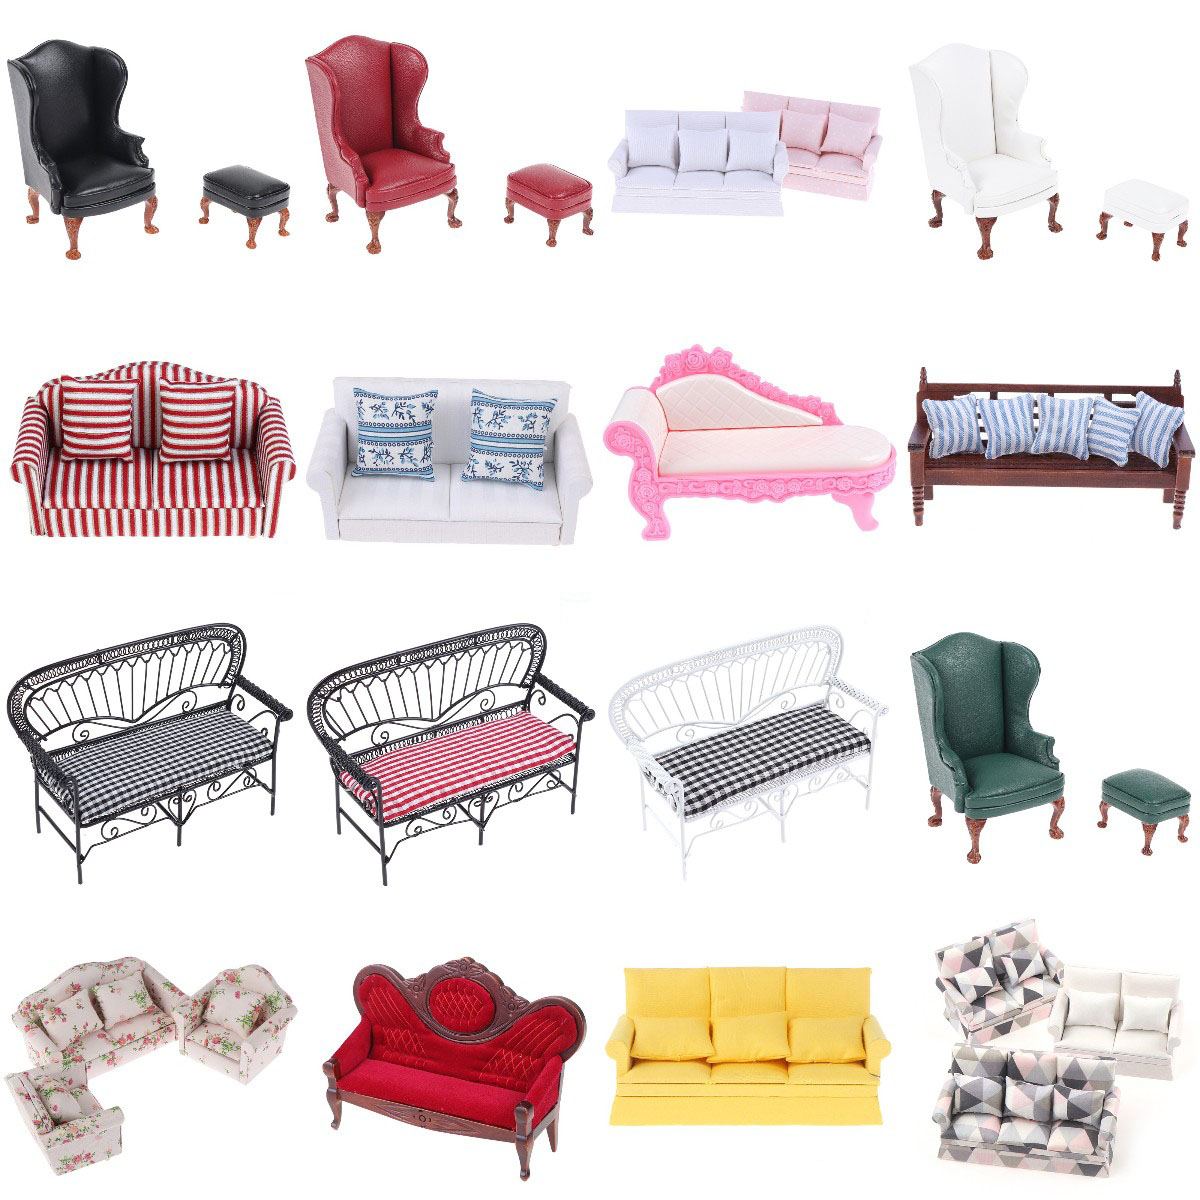 1:12 Dollhouse Miniature Furniture Set Sofa Accessory for Dolls Accessories Kids Gift Pretend Doll House Decor